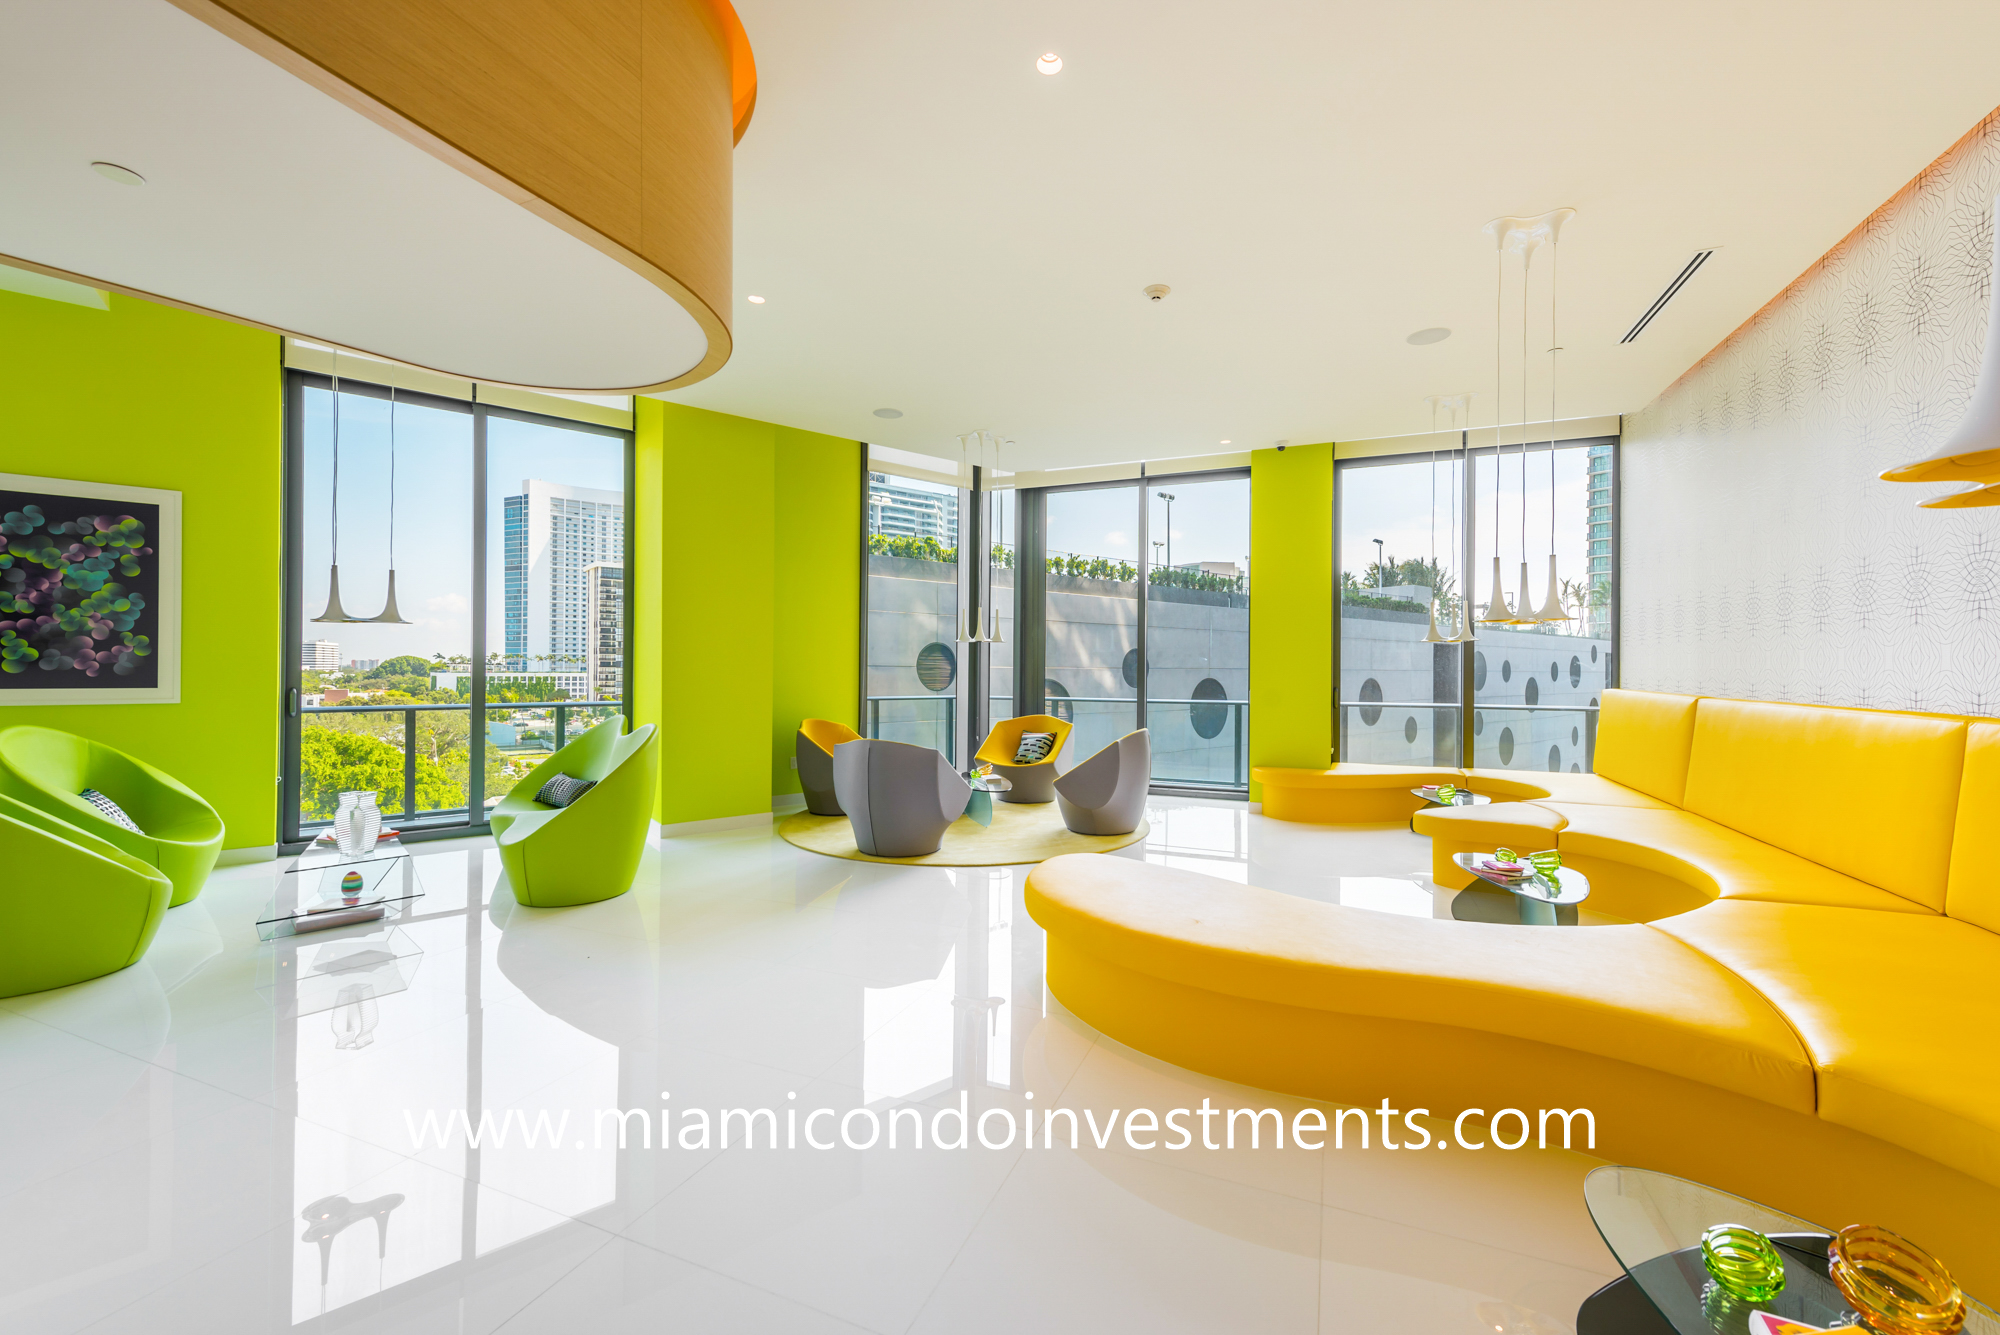 clubroom designed by Karim Rashid